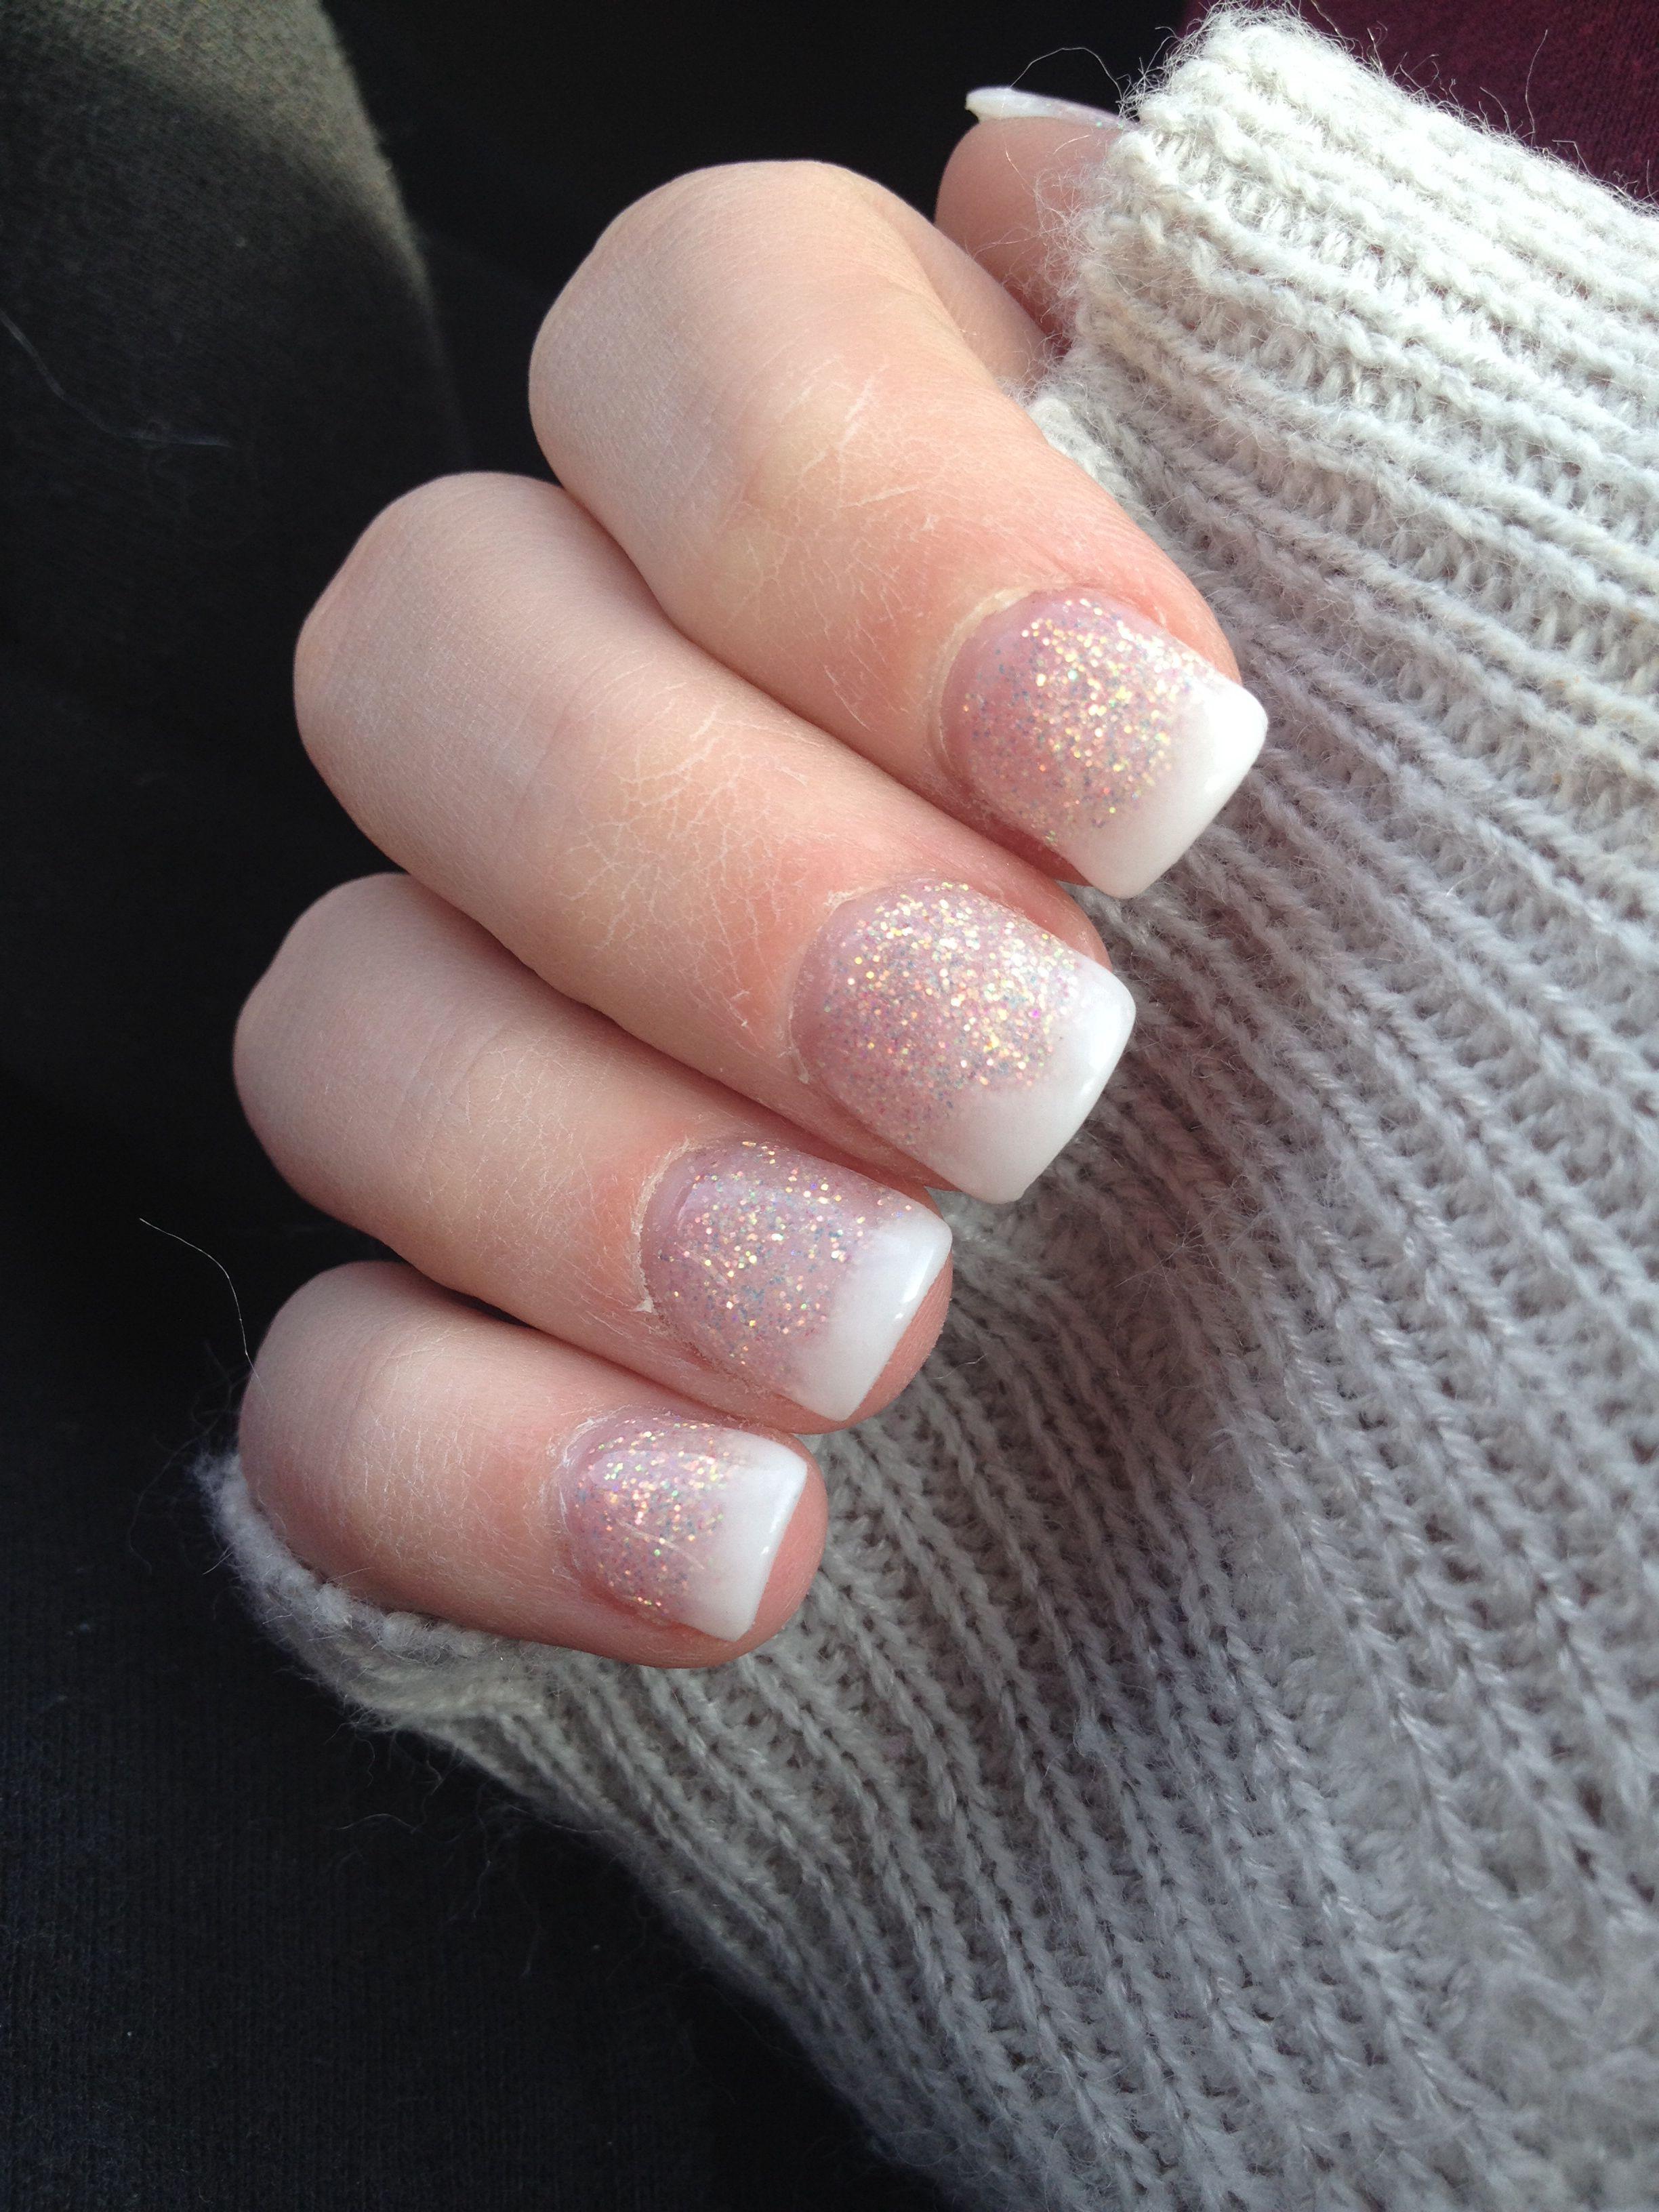 Antique White Sparkles W Natural White Tip Gel Nails Gel Nails Nails Pretty Nails Classy